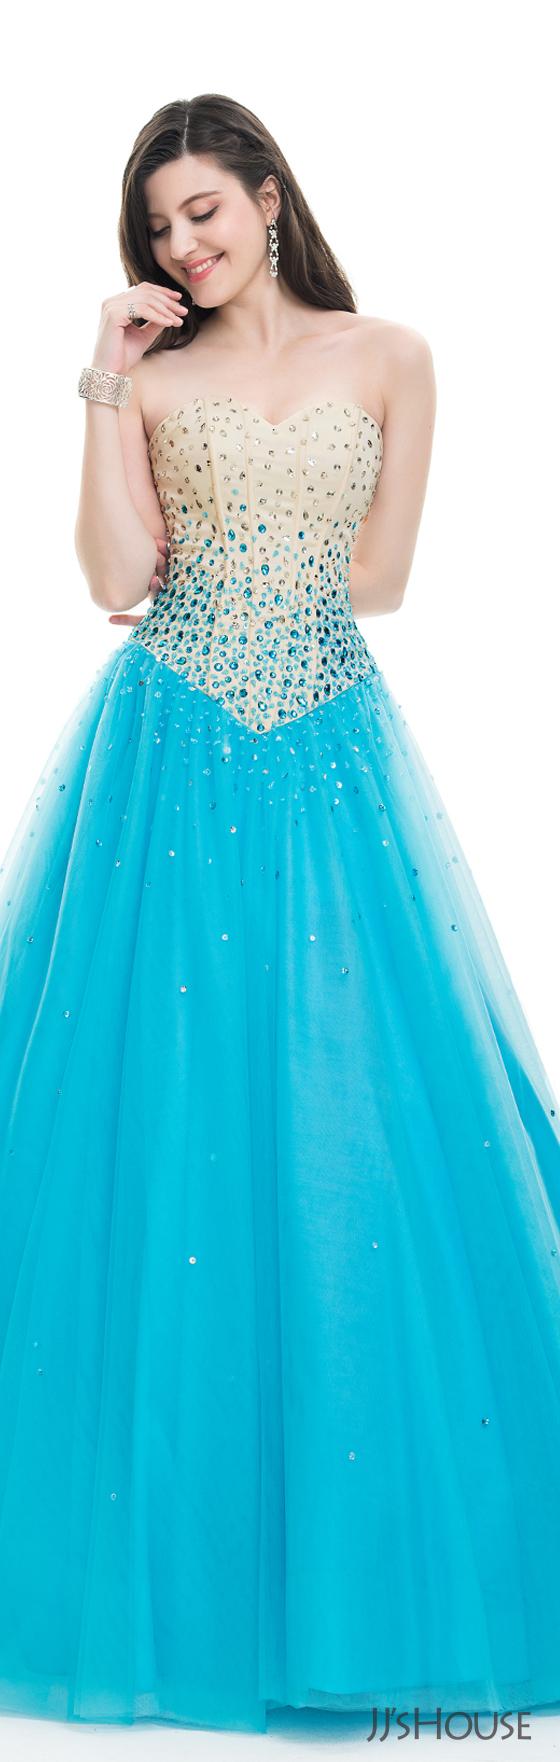 Colorful Prom Dresses Jjshouse Model - Wedding Dress - googeb.com